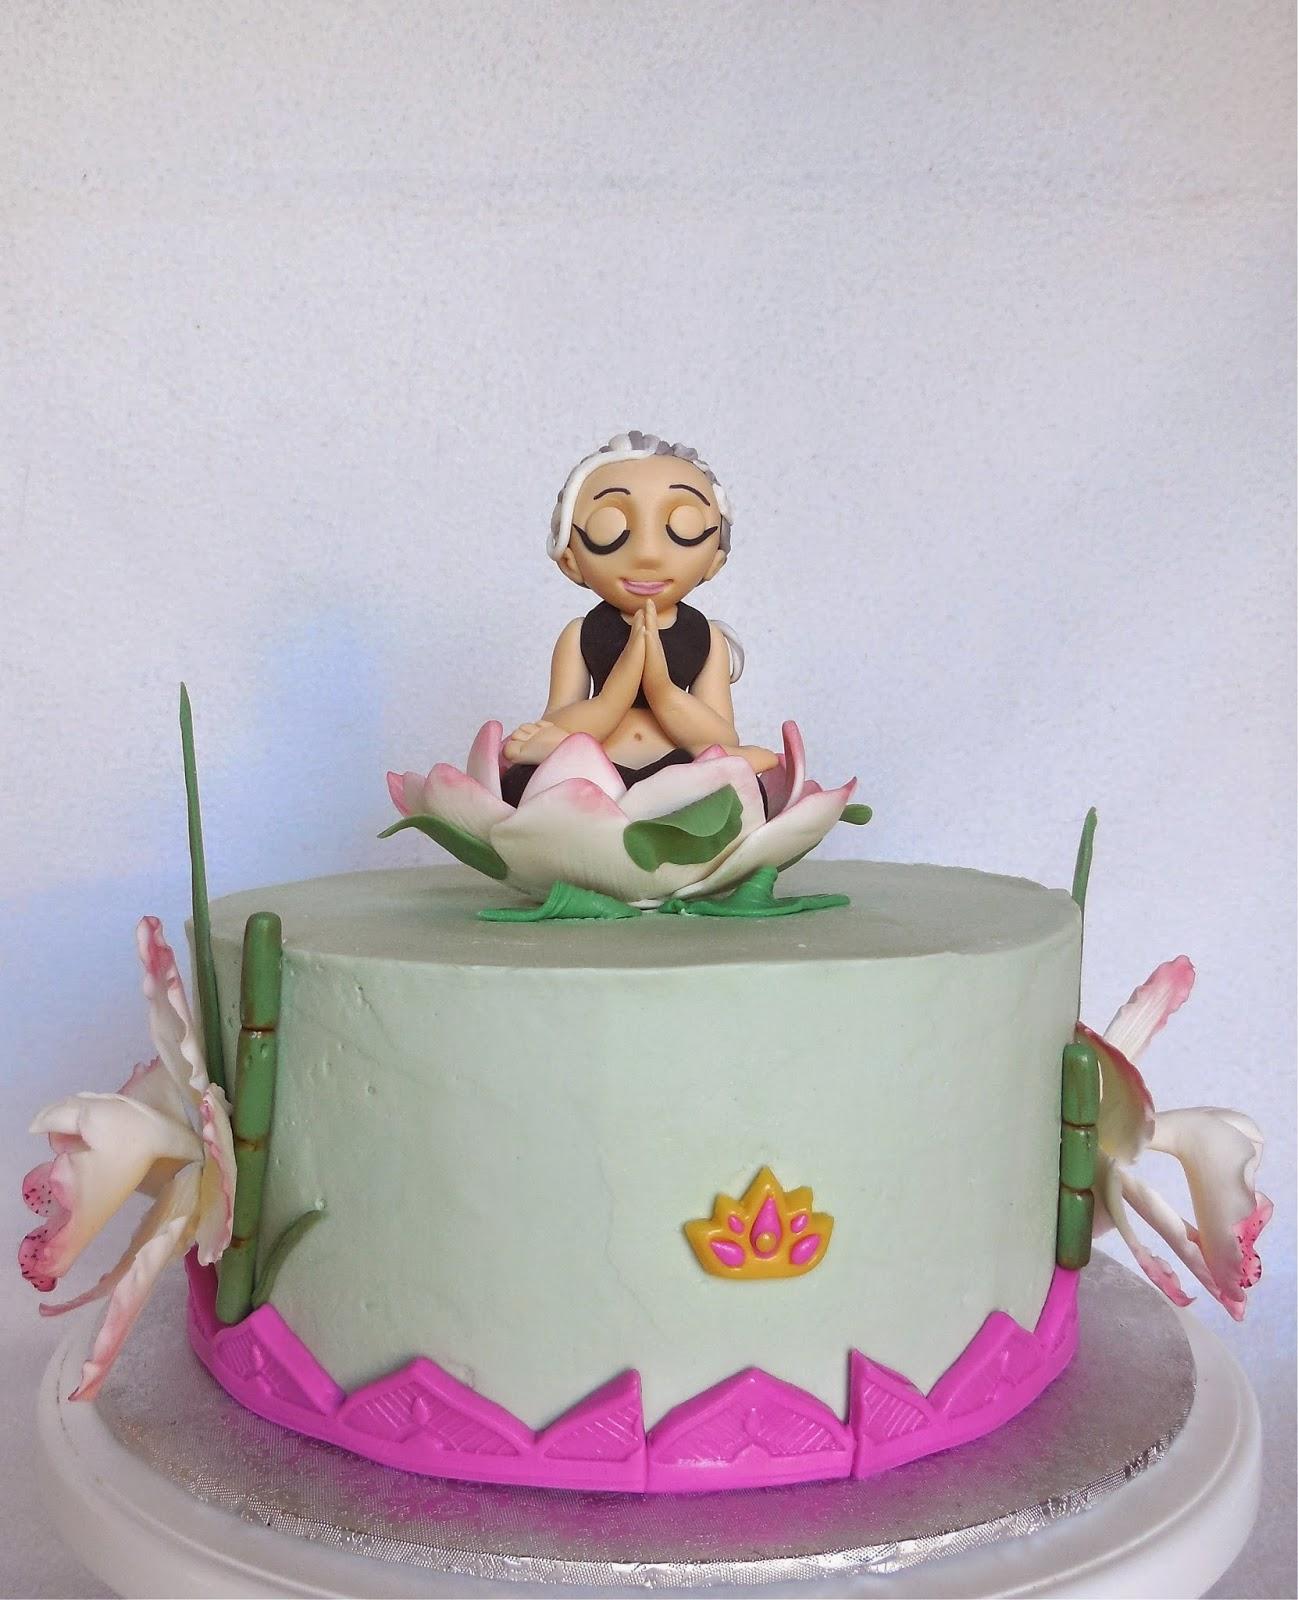 Custom Cakes By Lori Yoga Birthday Cake For An Eighty Year Old